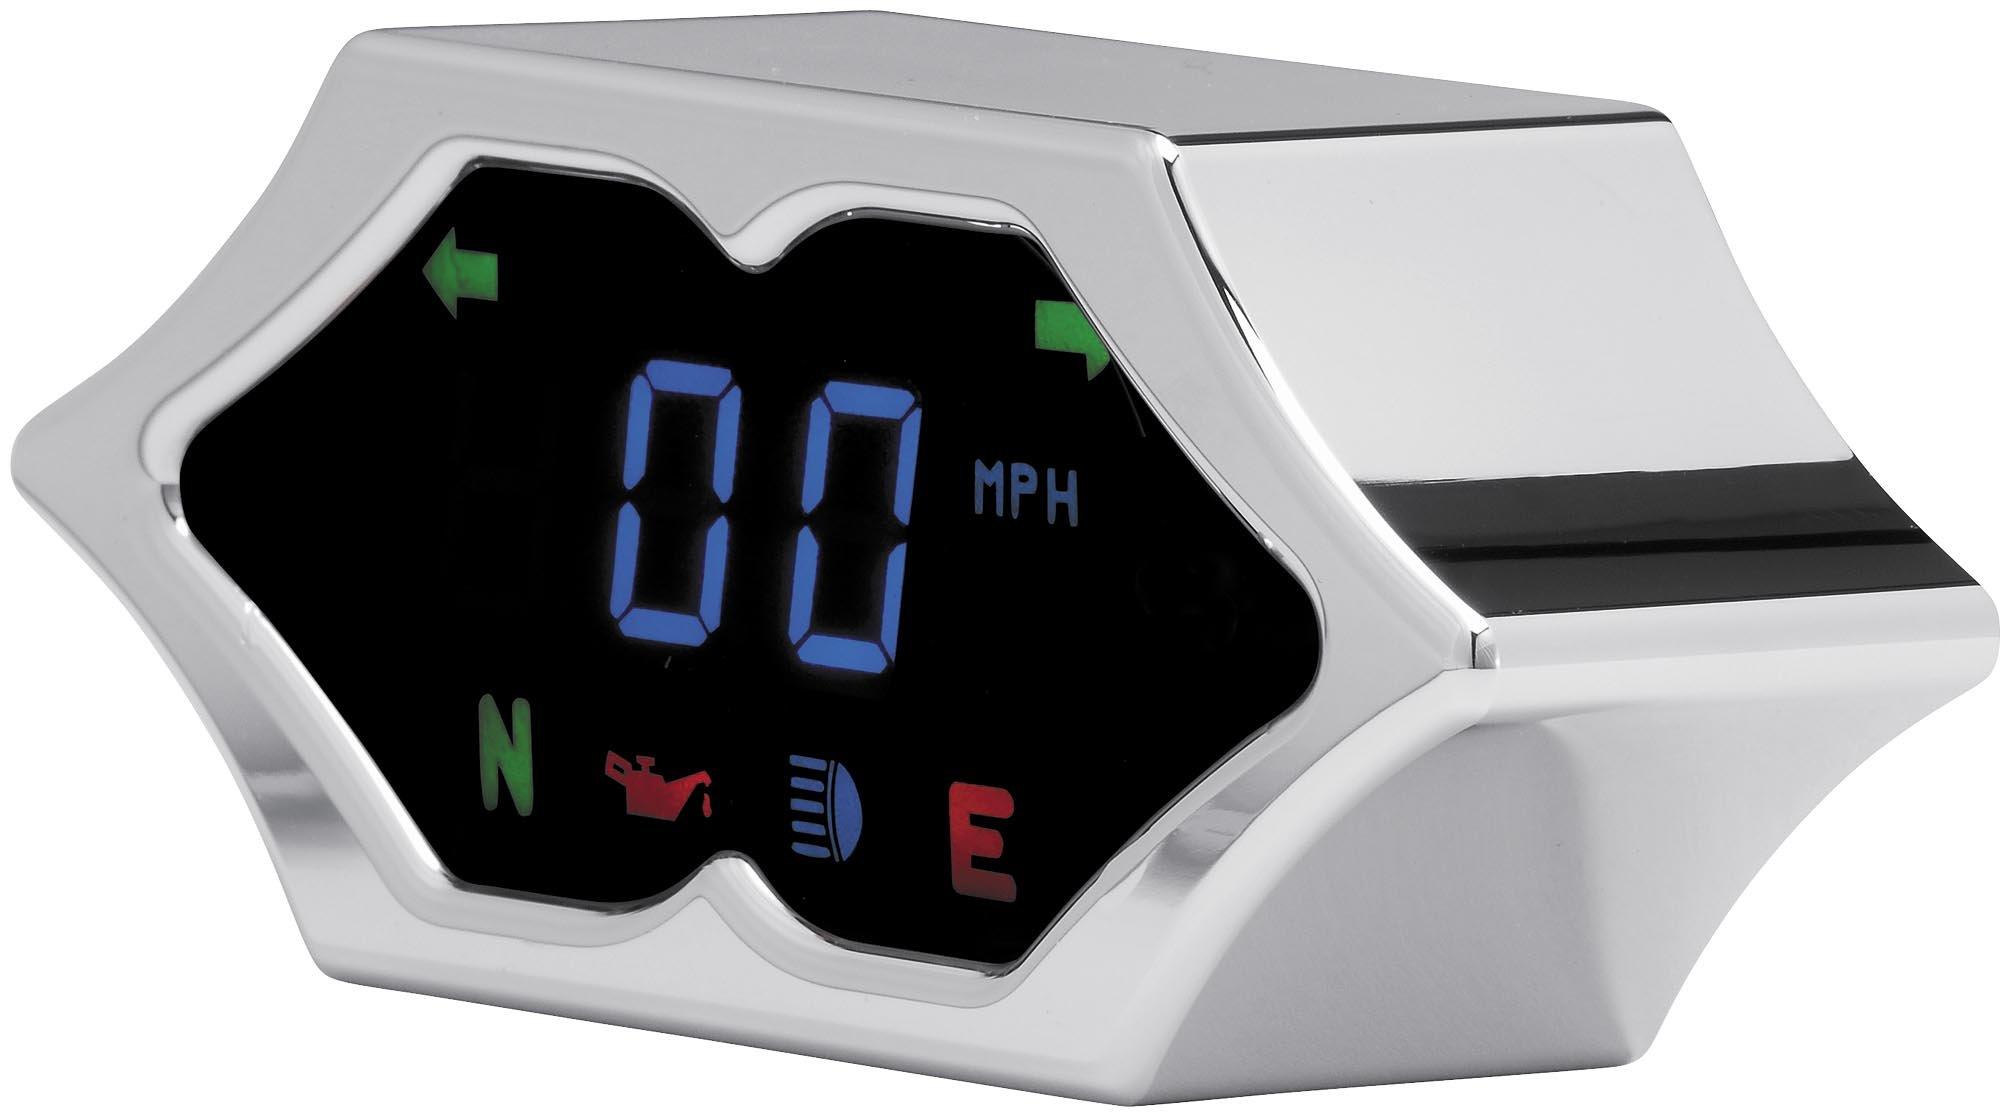 Dakota Digital MCL-5000 Series Spike Speedometer by Dakota Digital